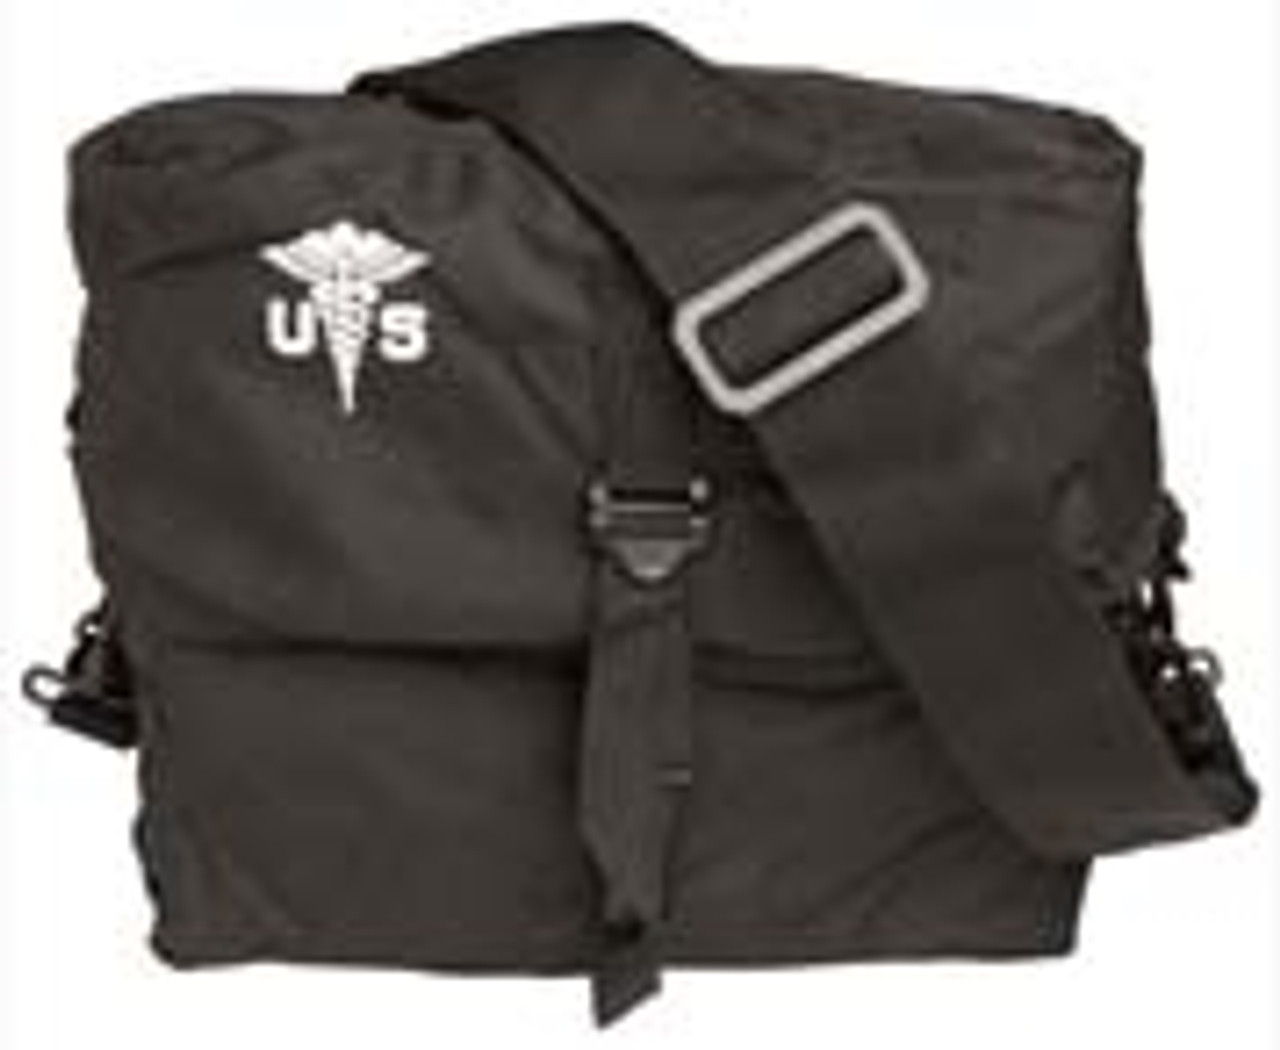 Mil-Tec Black Medical Kit Bag from Hessen Antique